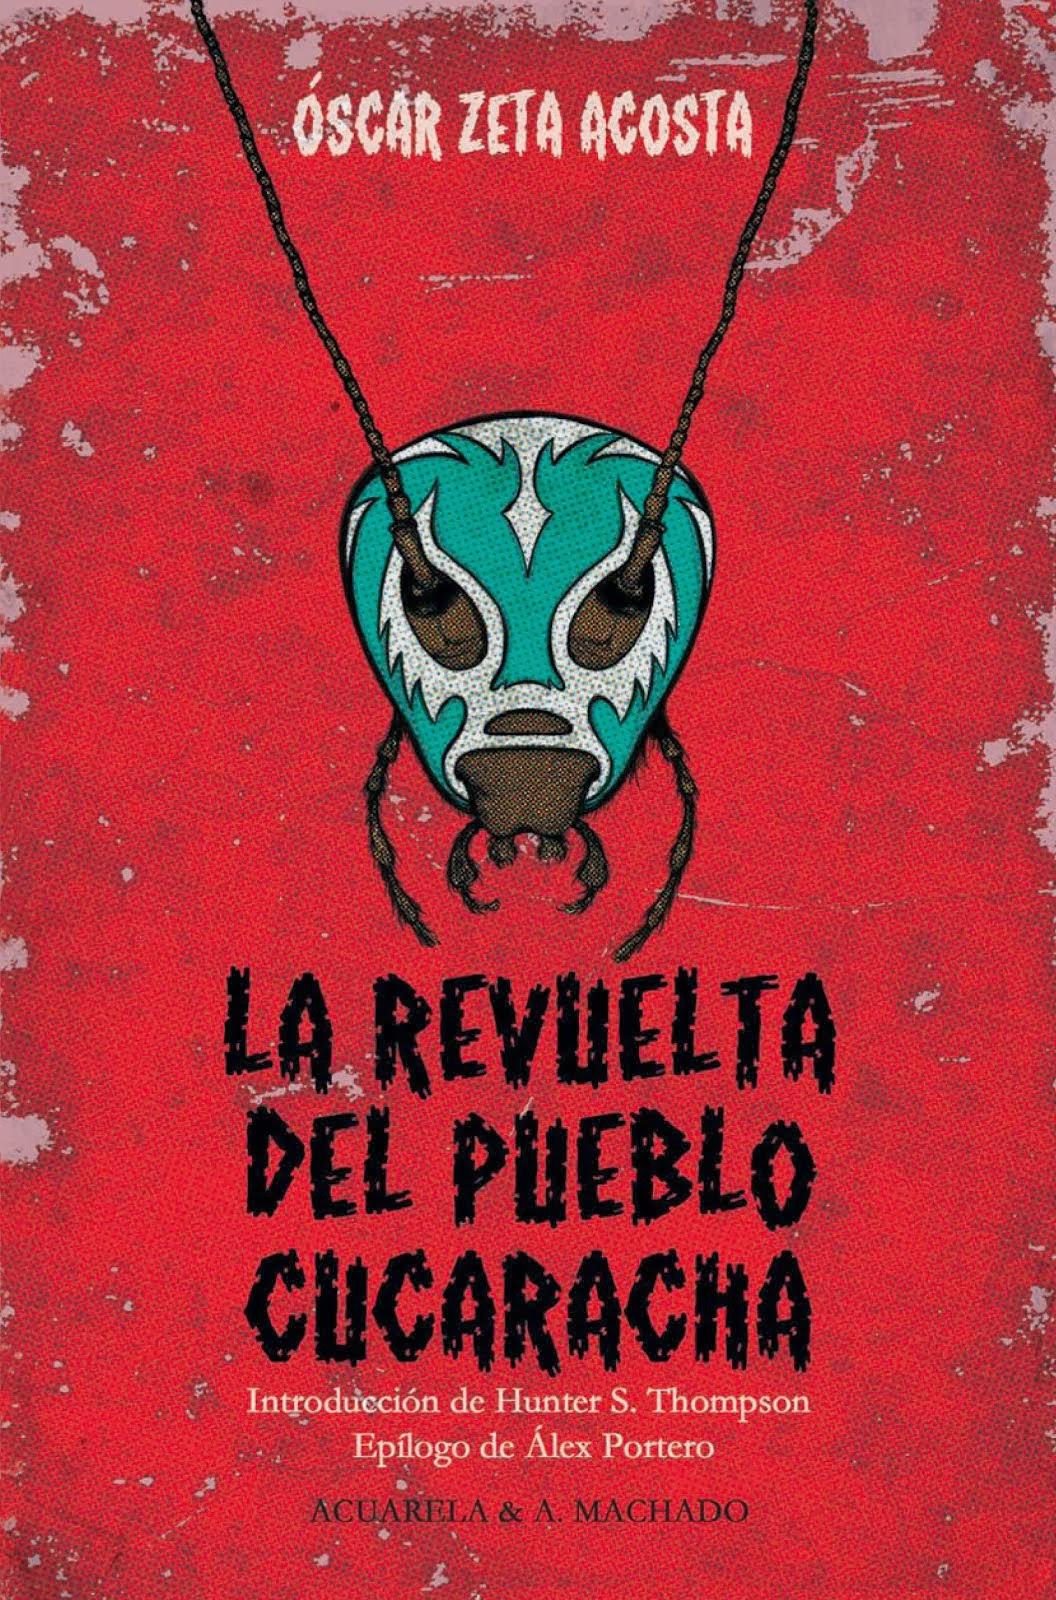 <i>LA REVUELTA DEL PUEBLO CUCARACHA</i>, de Óscar Zeta Acosta